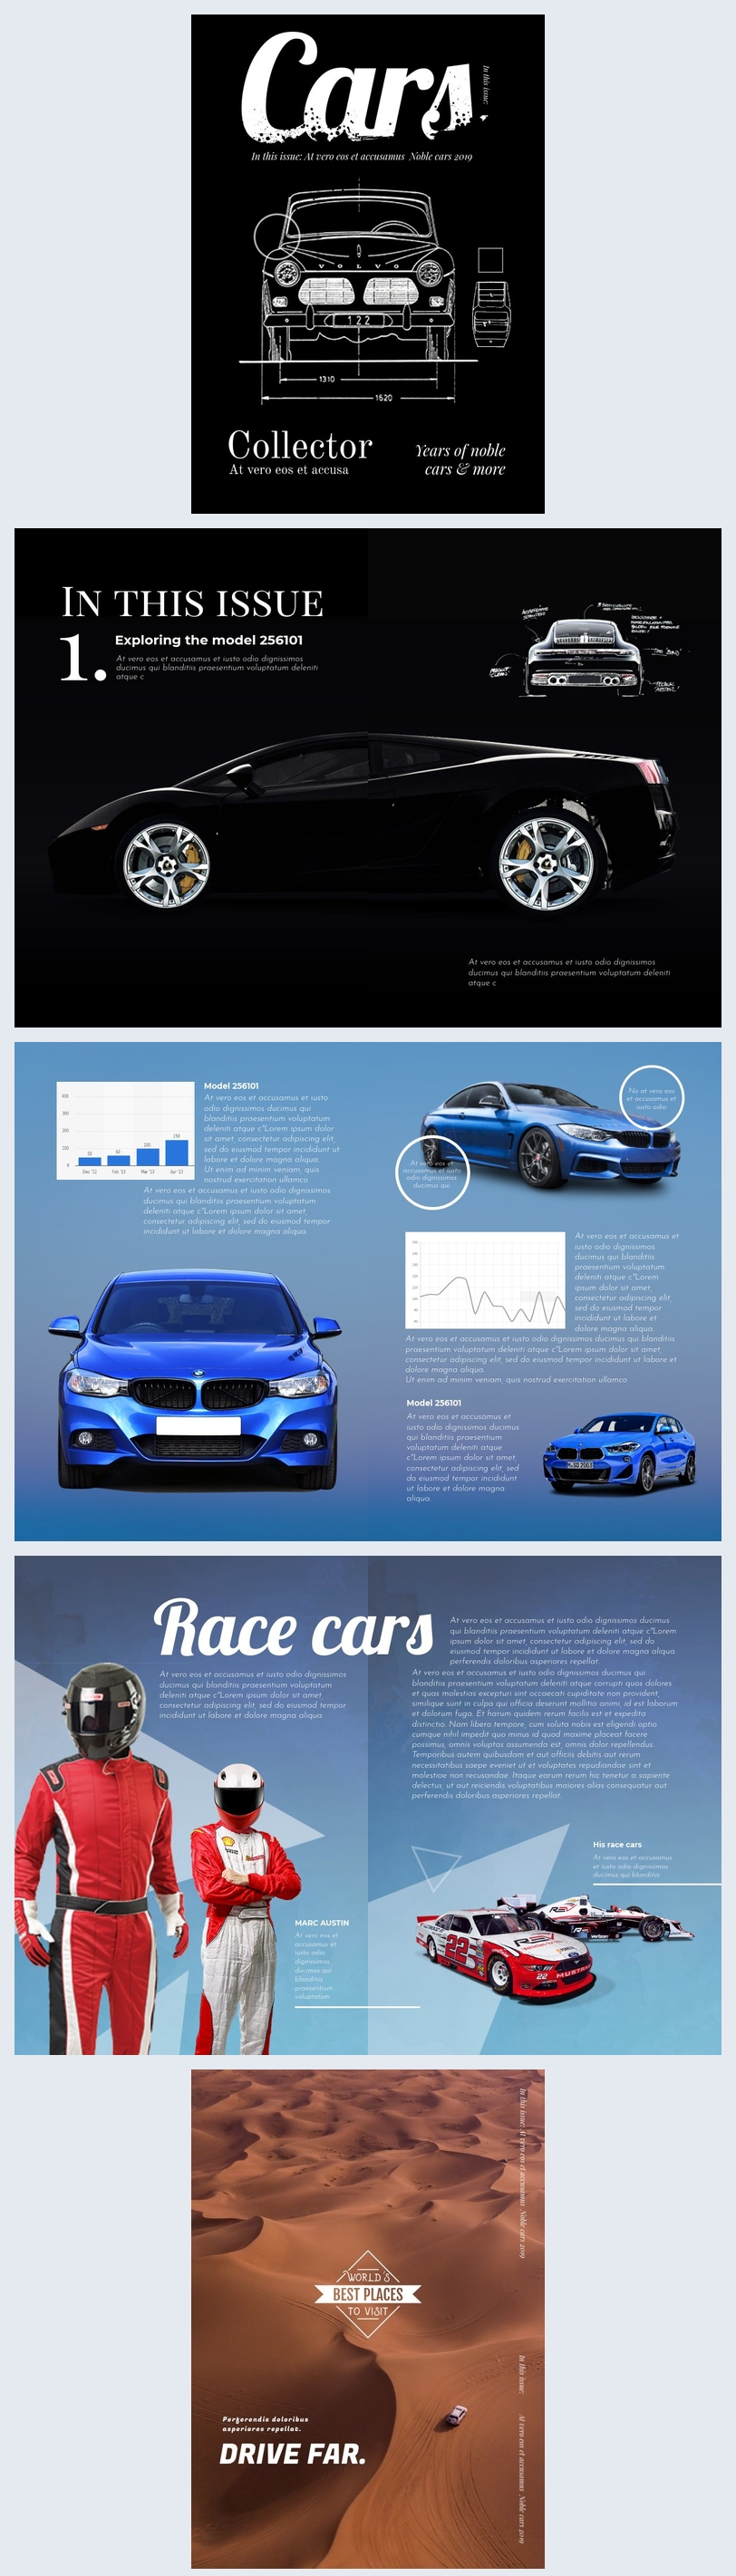 Car Magazine Template & Design